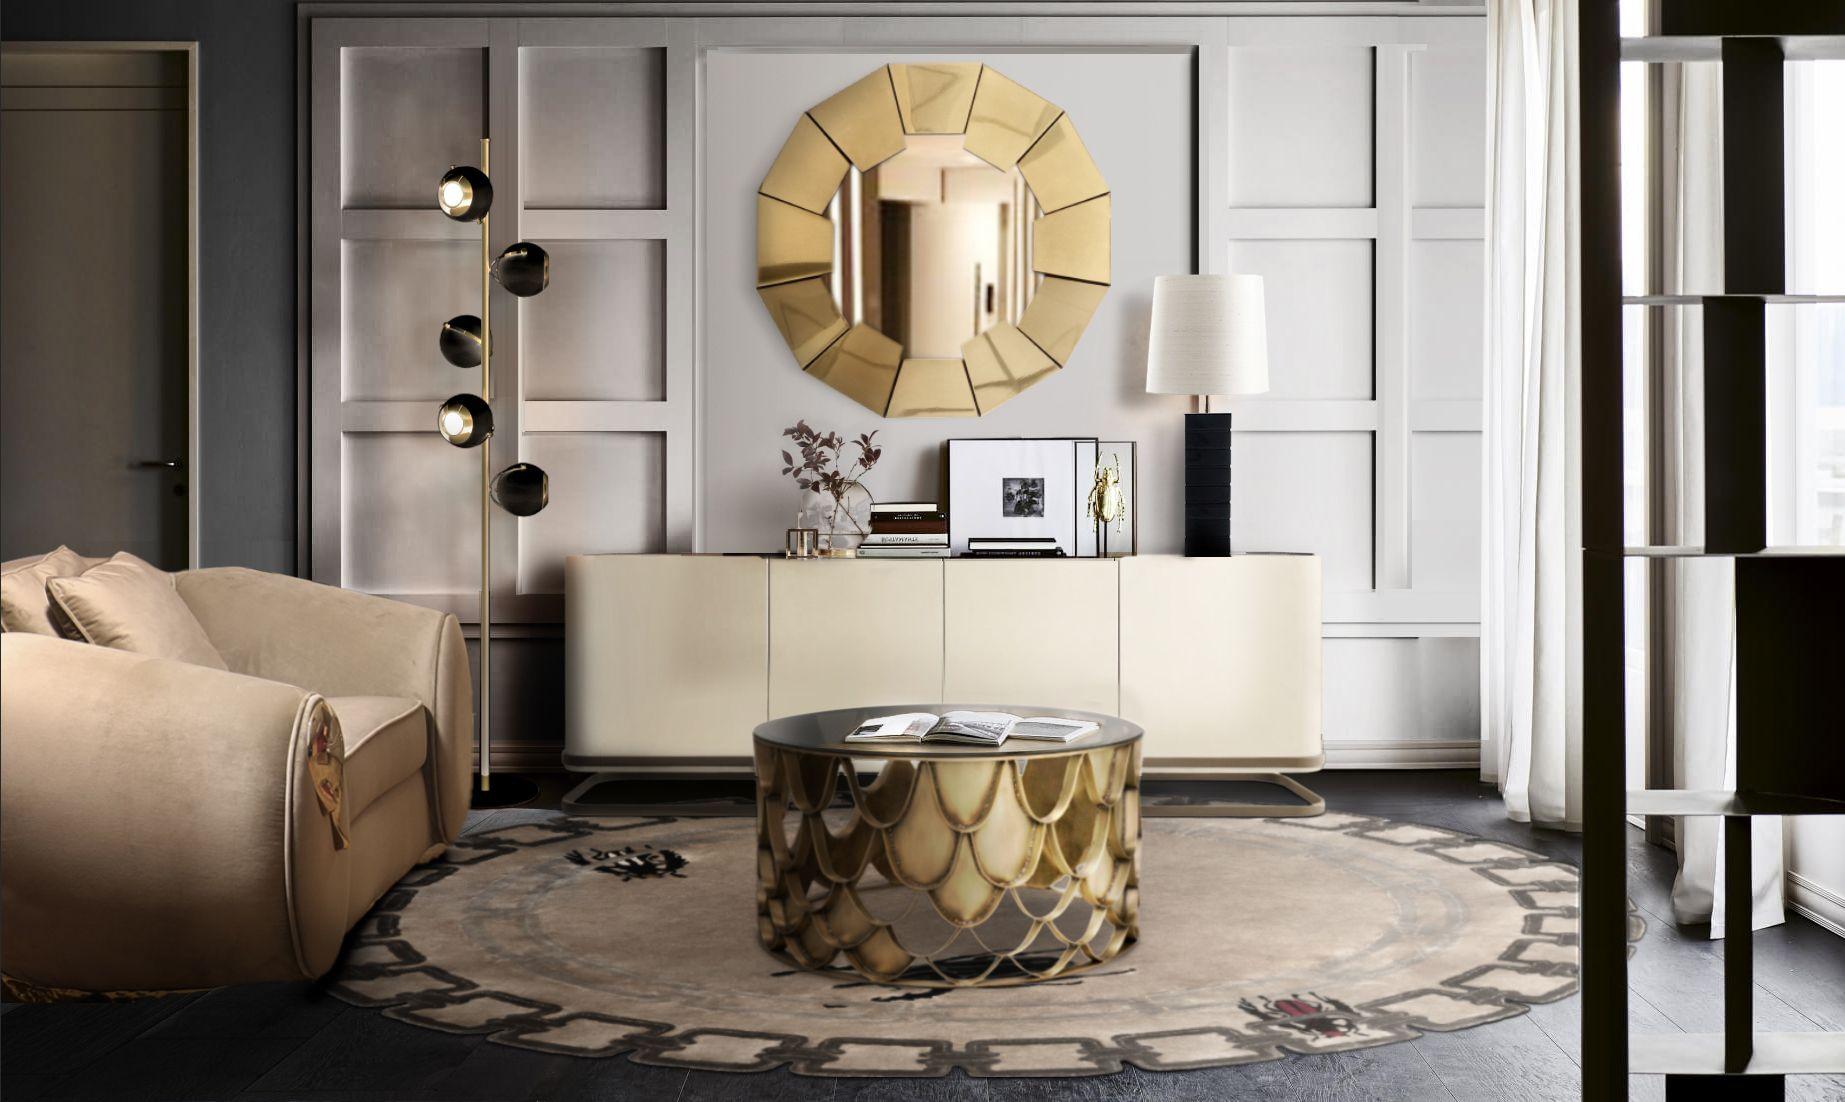 5 Minimalistic Living Room Sets That Will Make You Curl Up In All Fall! living room 5 Minimalistic Living Room Sets That Will Make You Curl Up In All Fall! 2 1